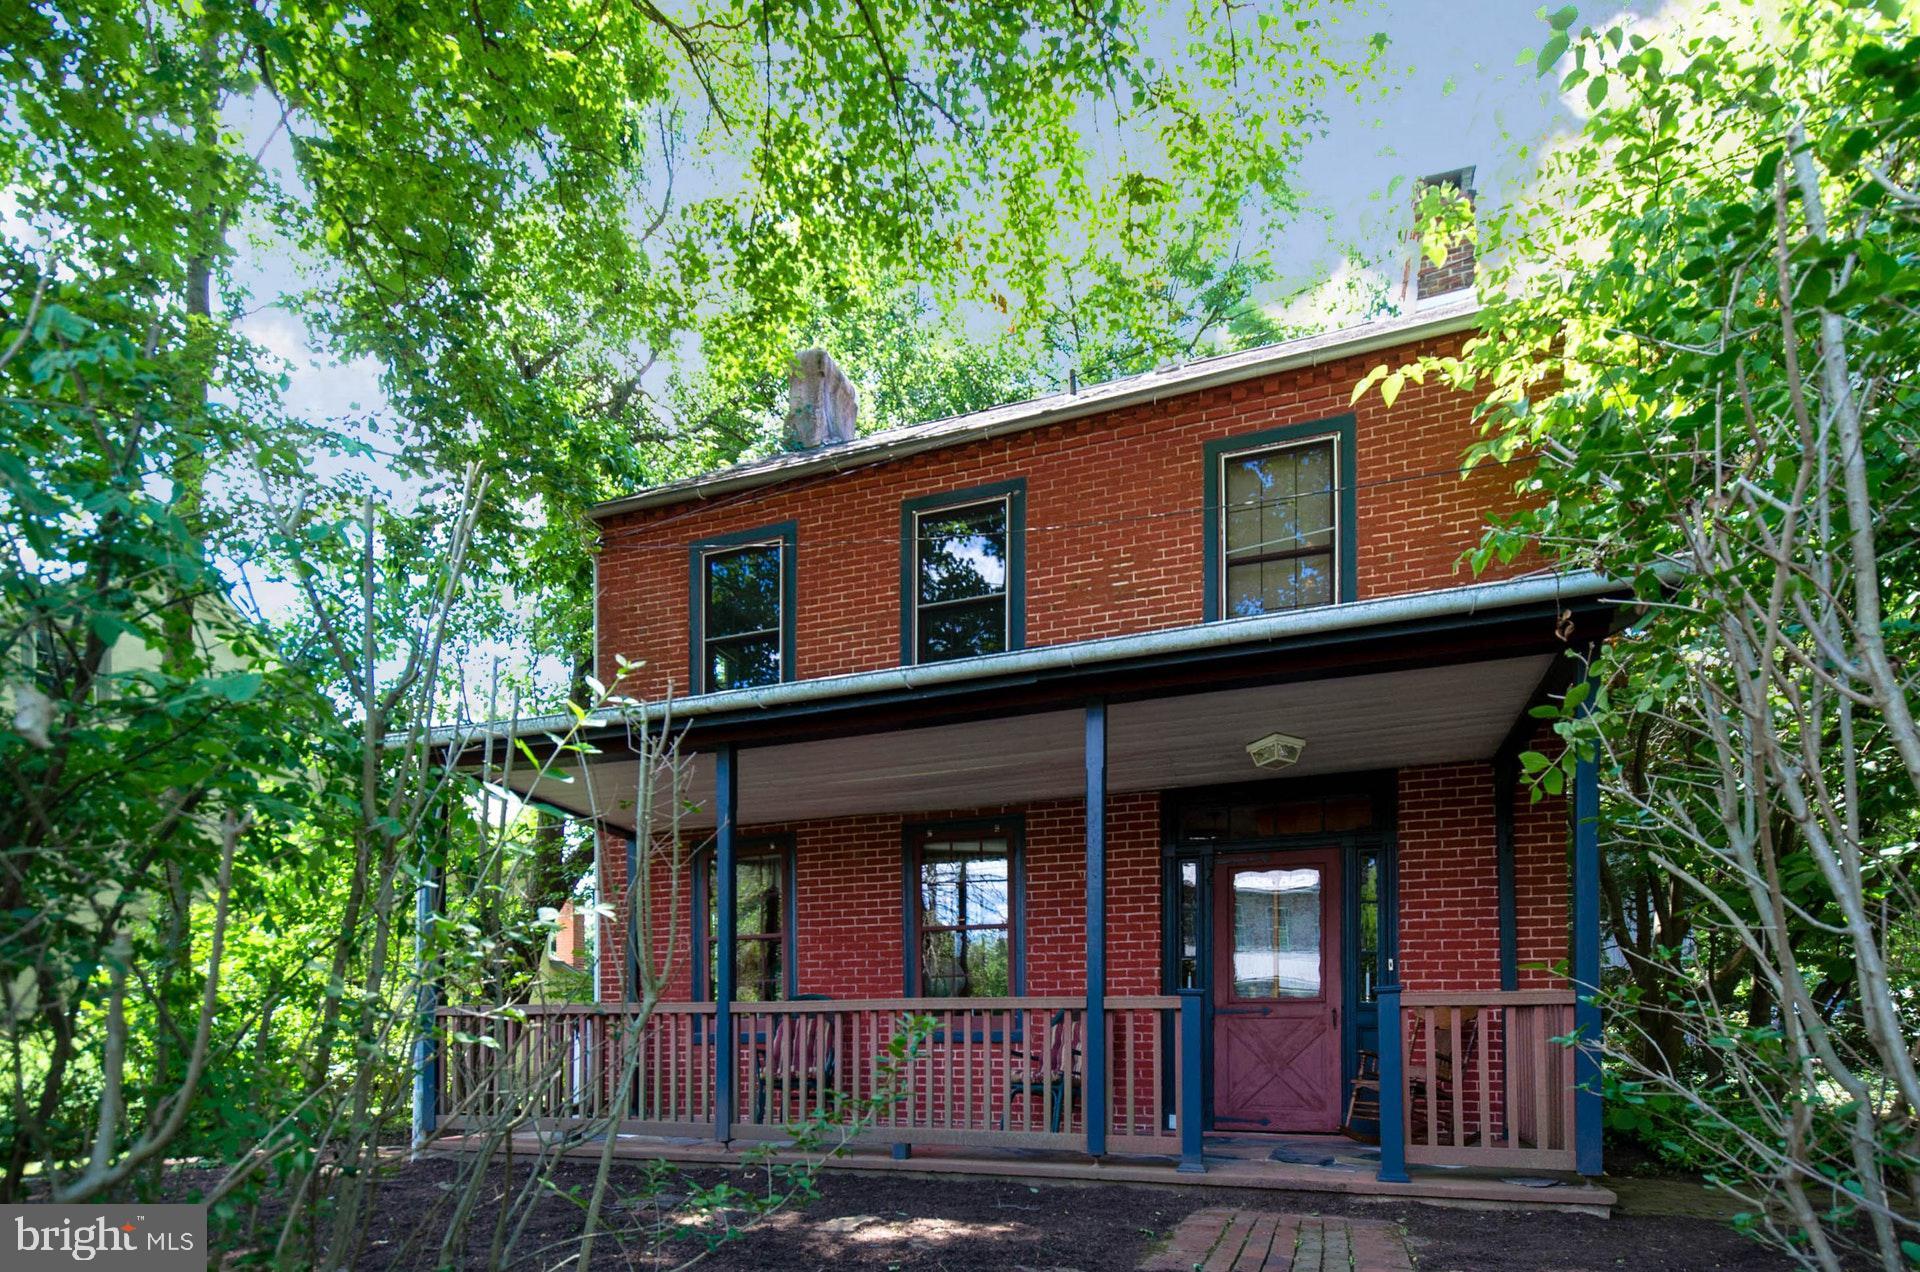 887 OLD BETHLEHEM RD, Quakertown, PA 18951 Quakertown PA